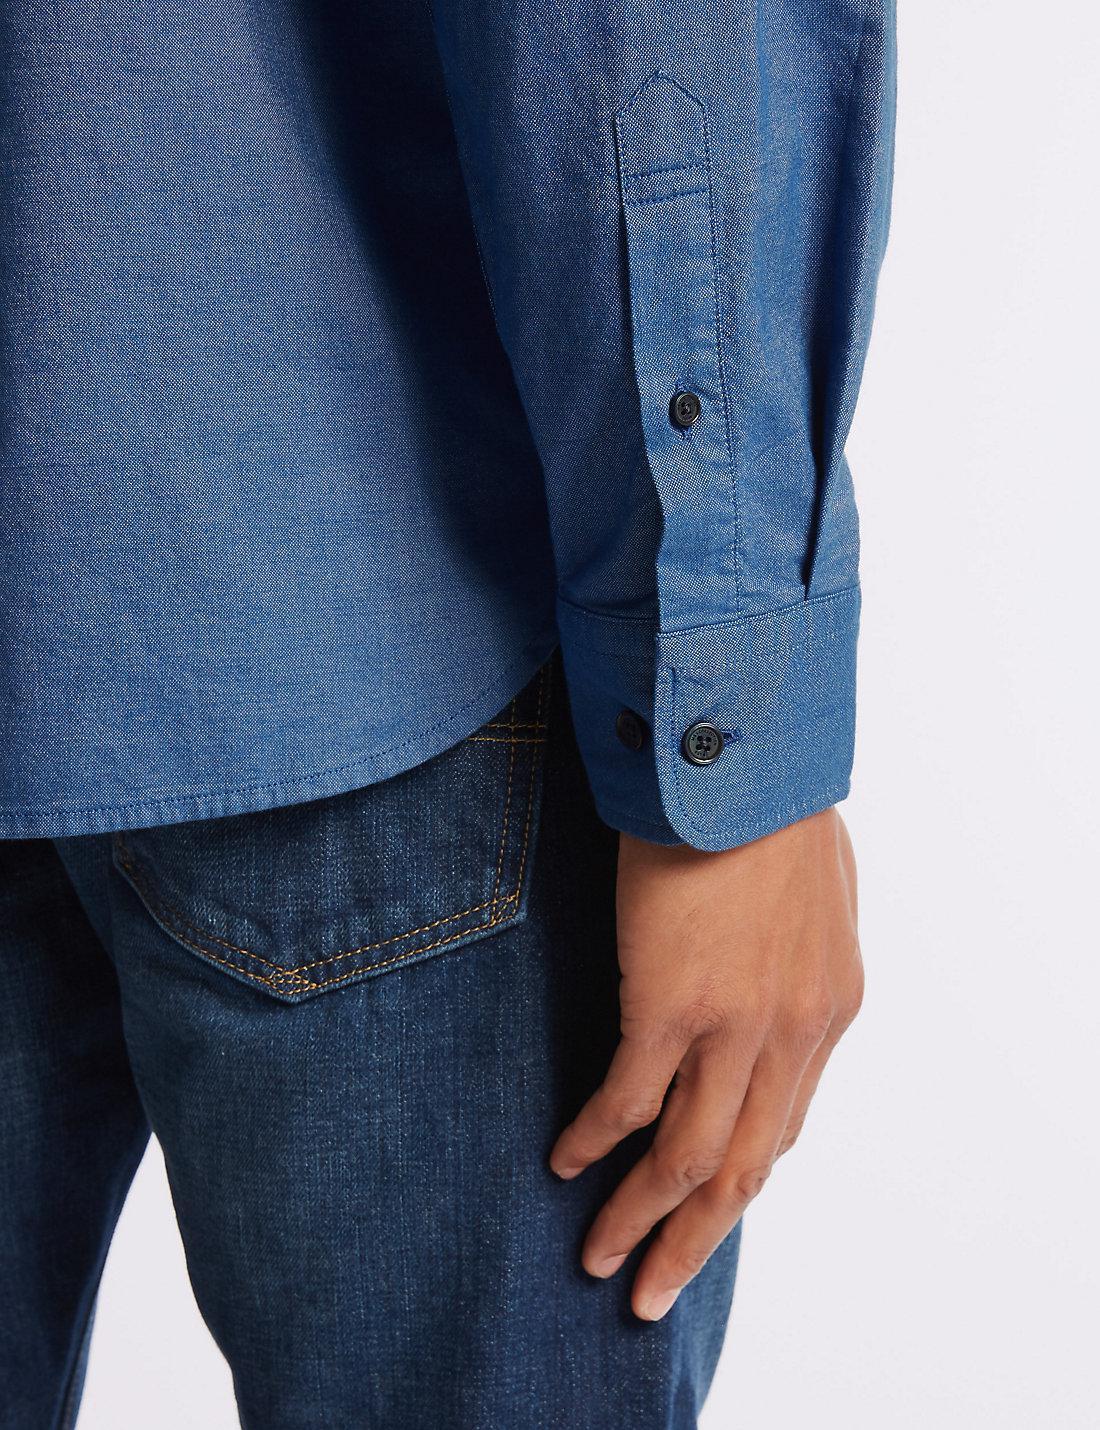 Lyst Marks Spencer Pure Cotton Oxford Shirt With Pocket In Blue Hanger Marksspencer Slim View Fullscreen